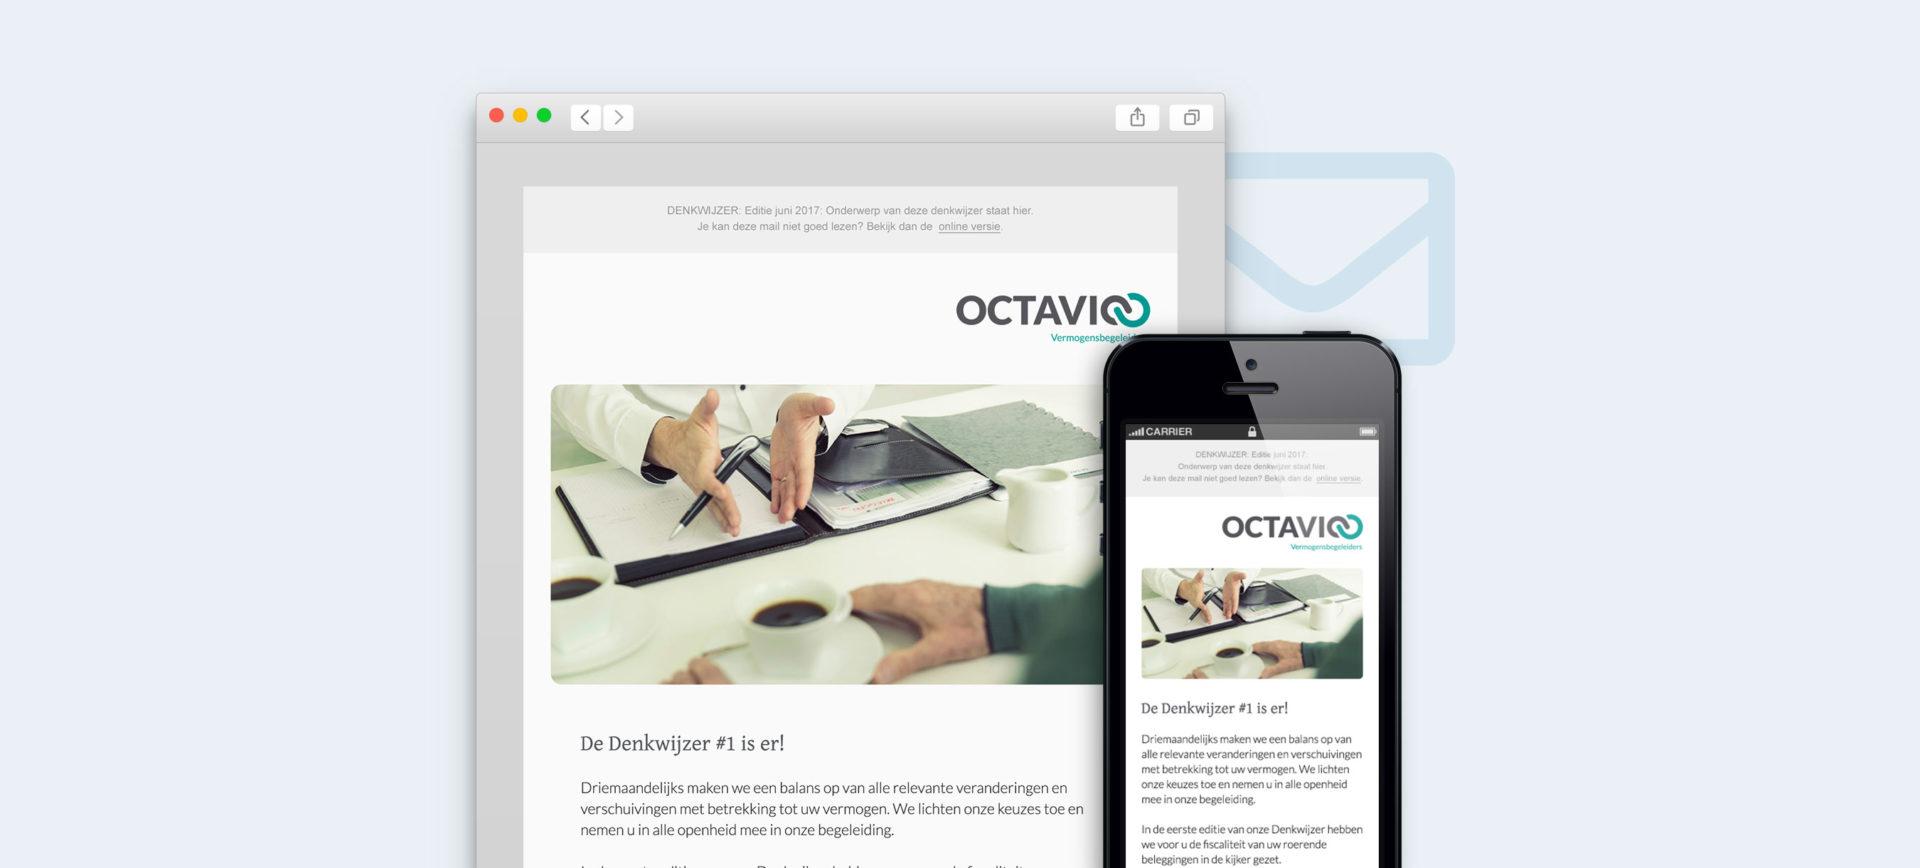 project-octavio-image_6